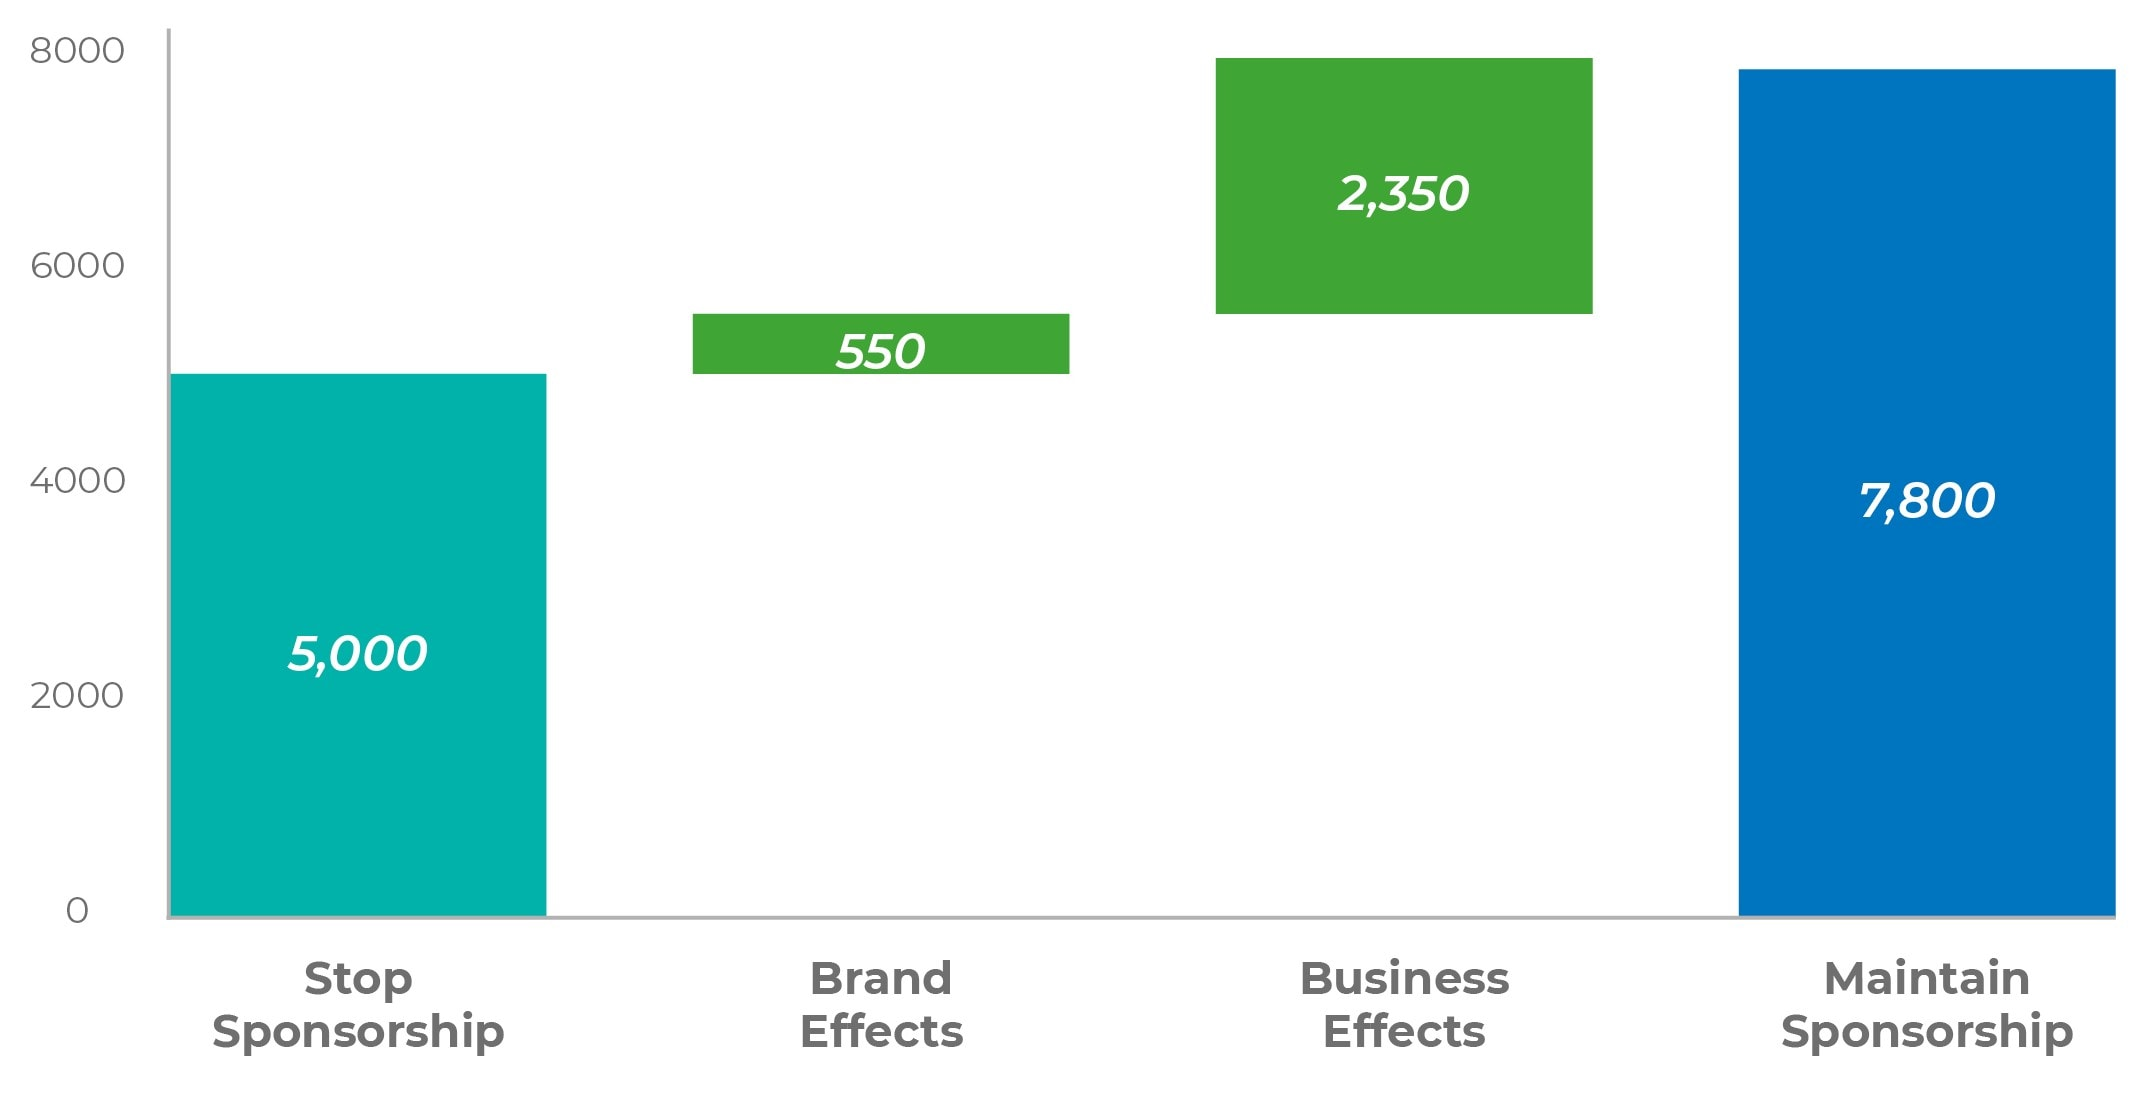 Sponsorship Valuation: Change in Brand Value from Sponsorship Decision